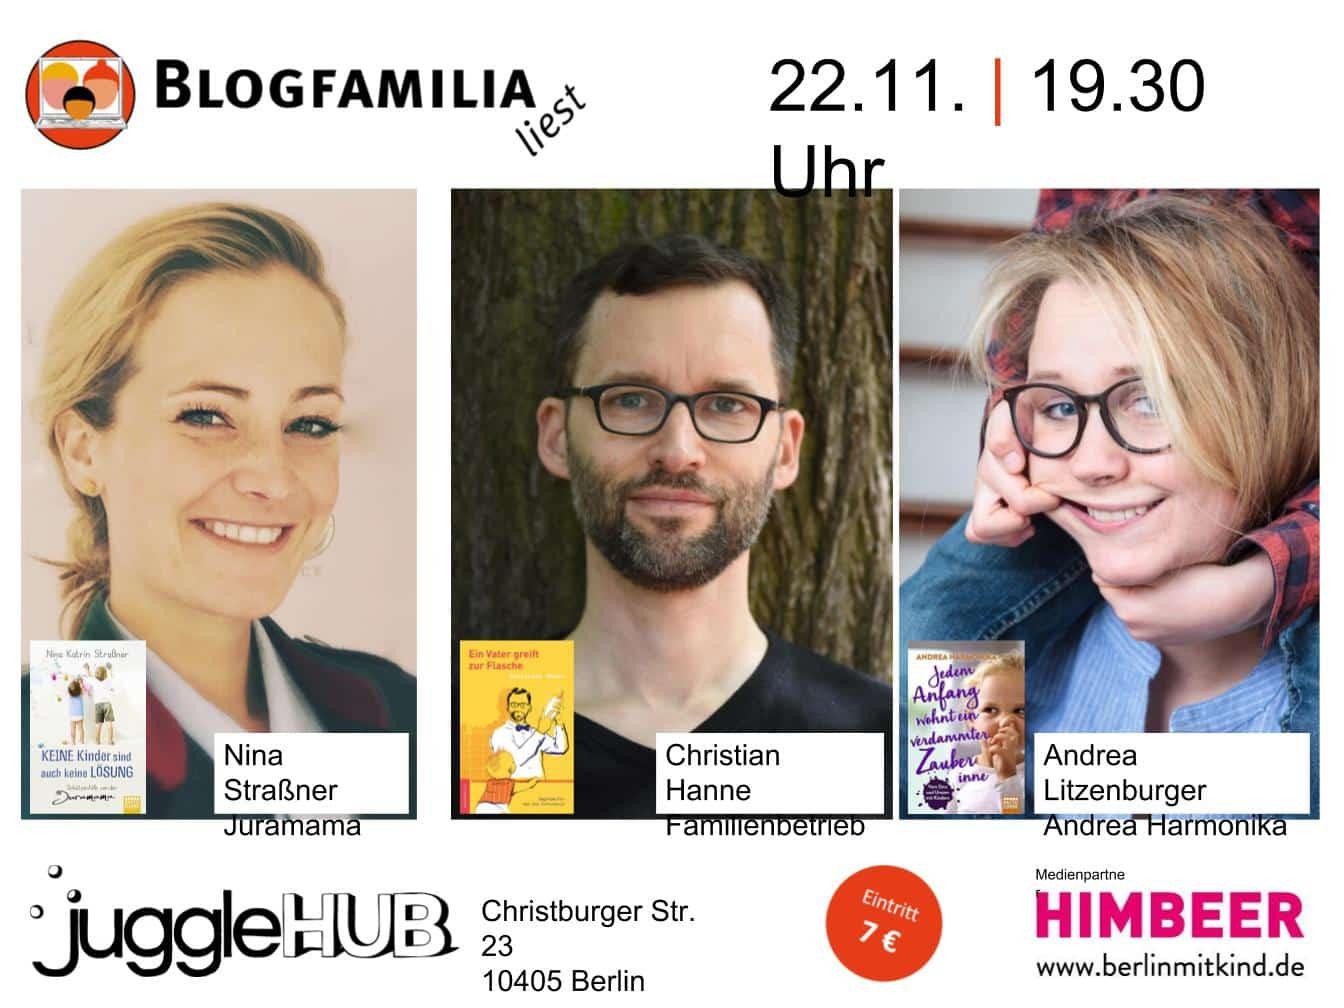 Blogfamilia liest Berlin